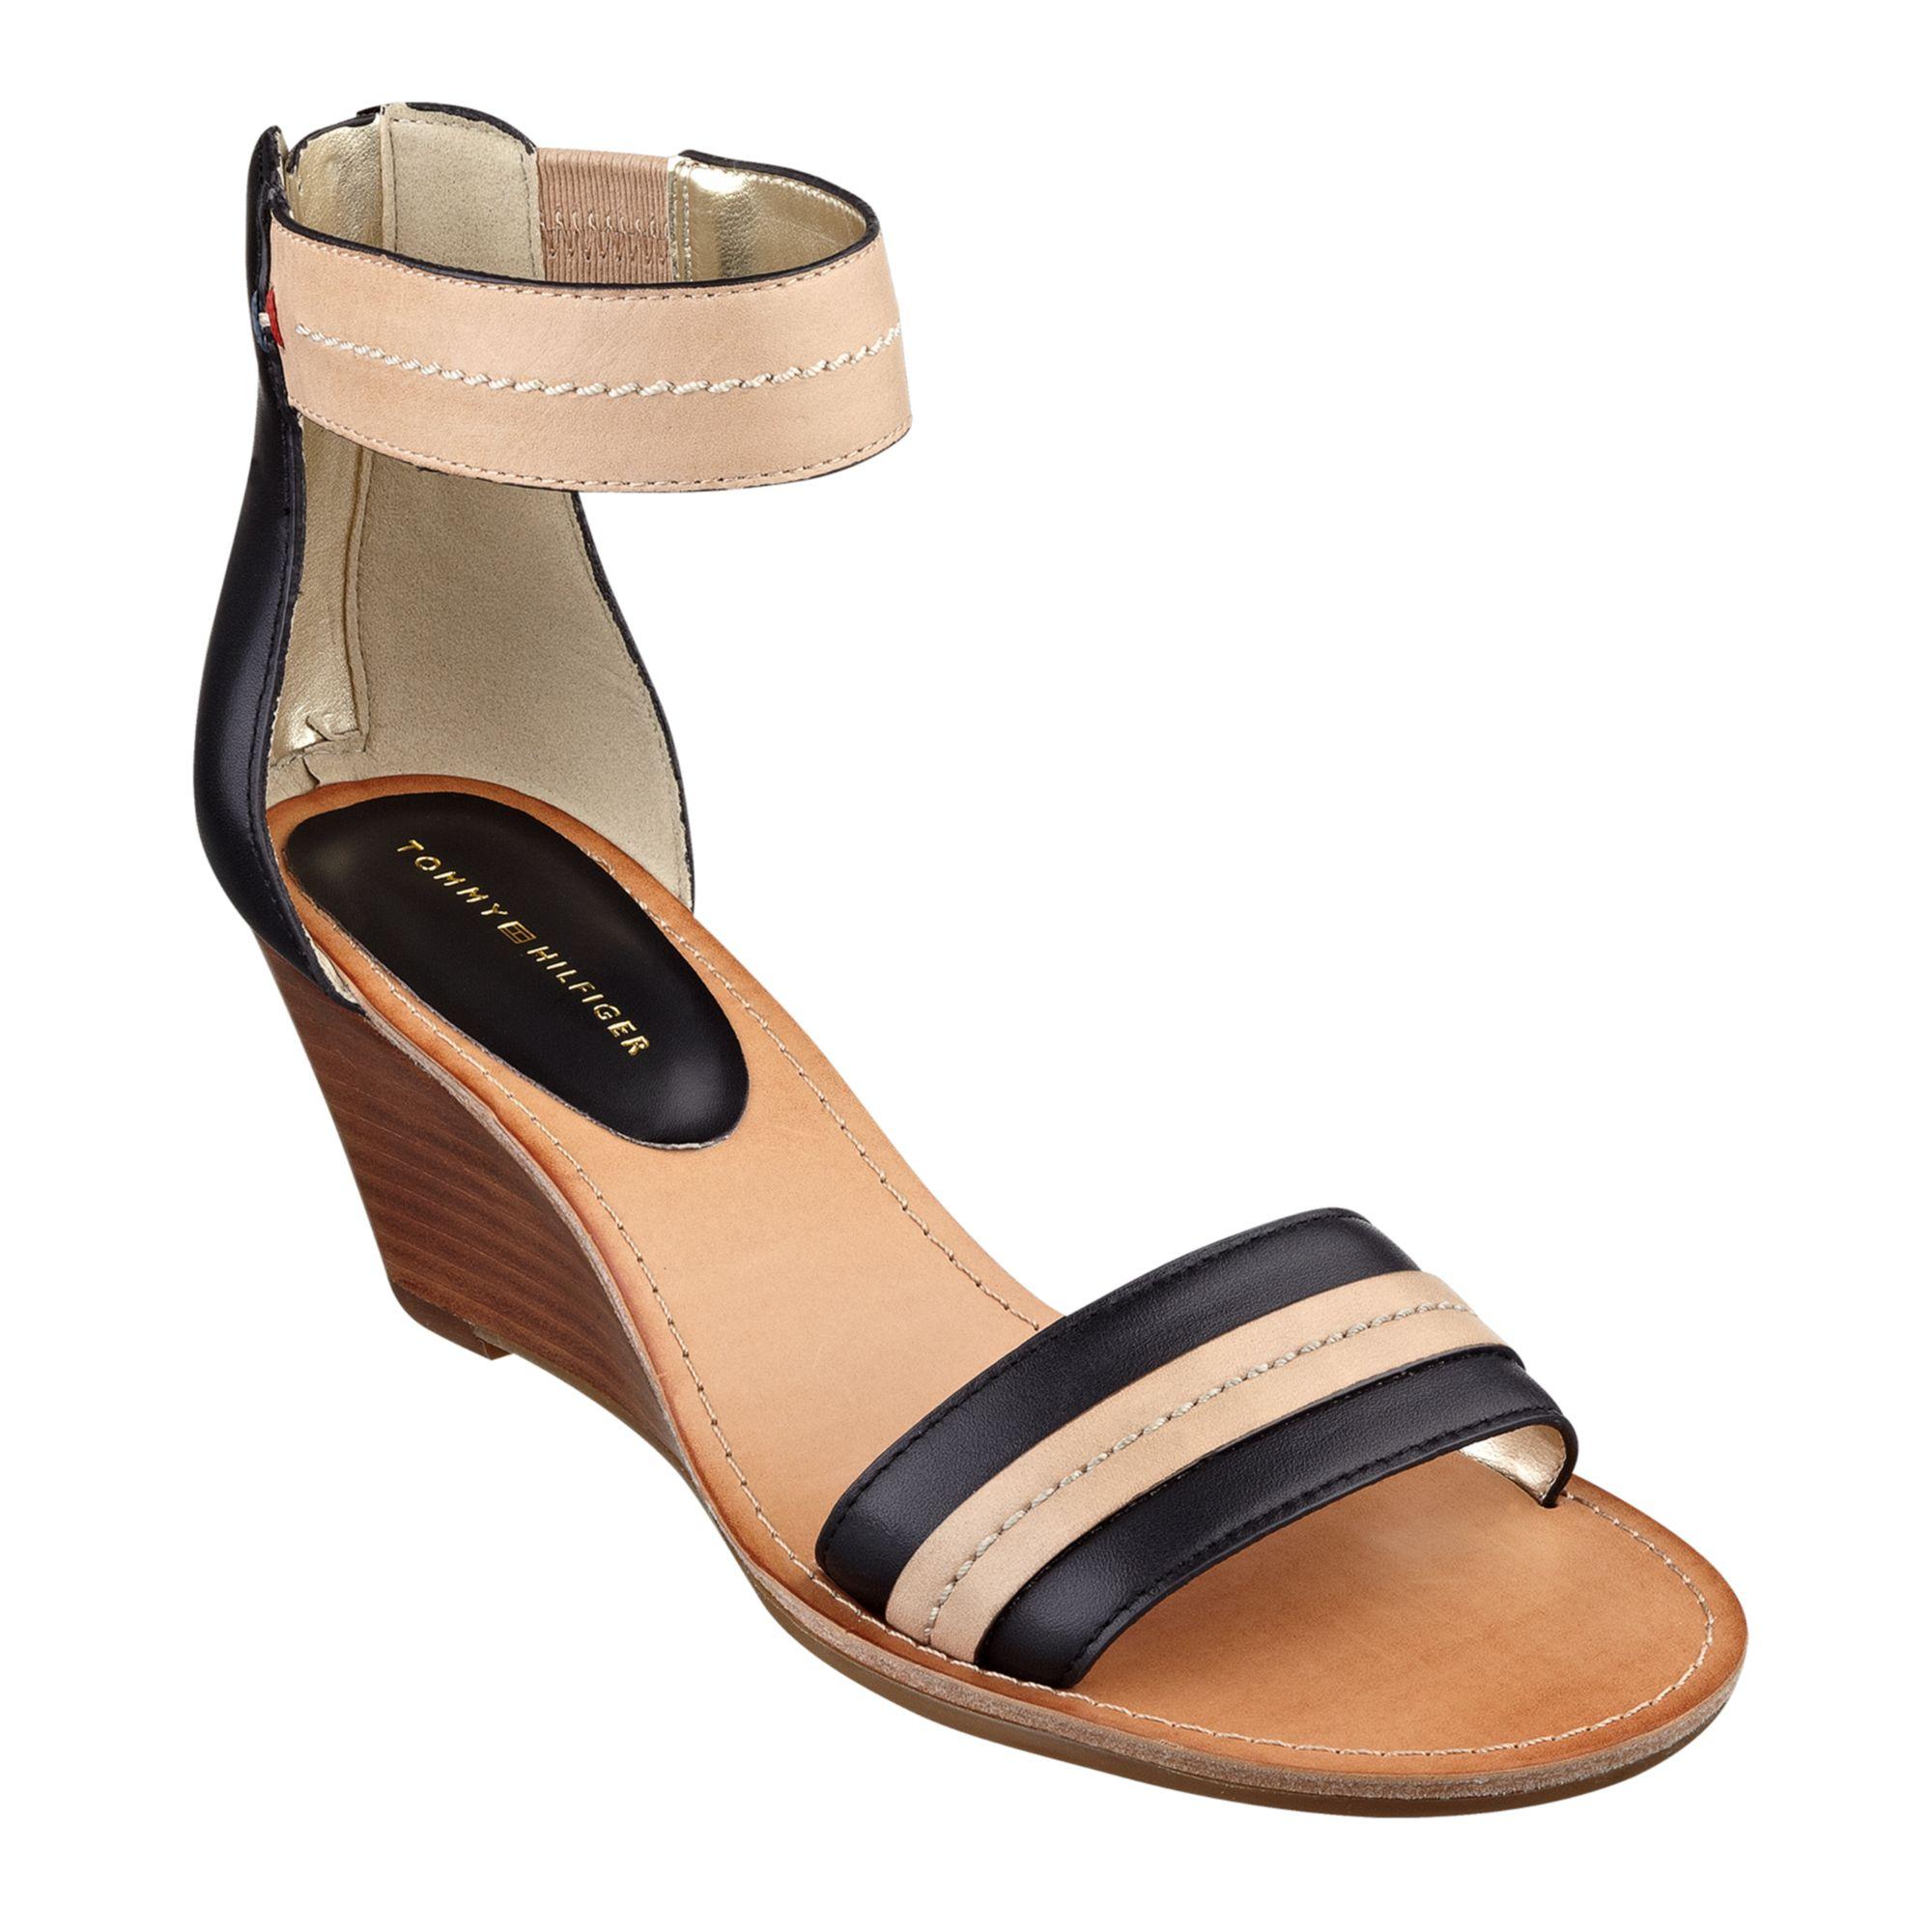 e05693c9af87 Lyst - Tommy Hilfiger Women S Yara Akle Strap Wedge Sandals in Black